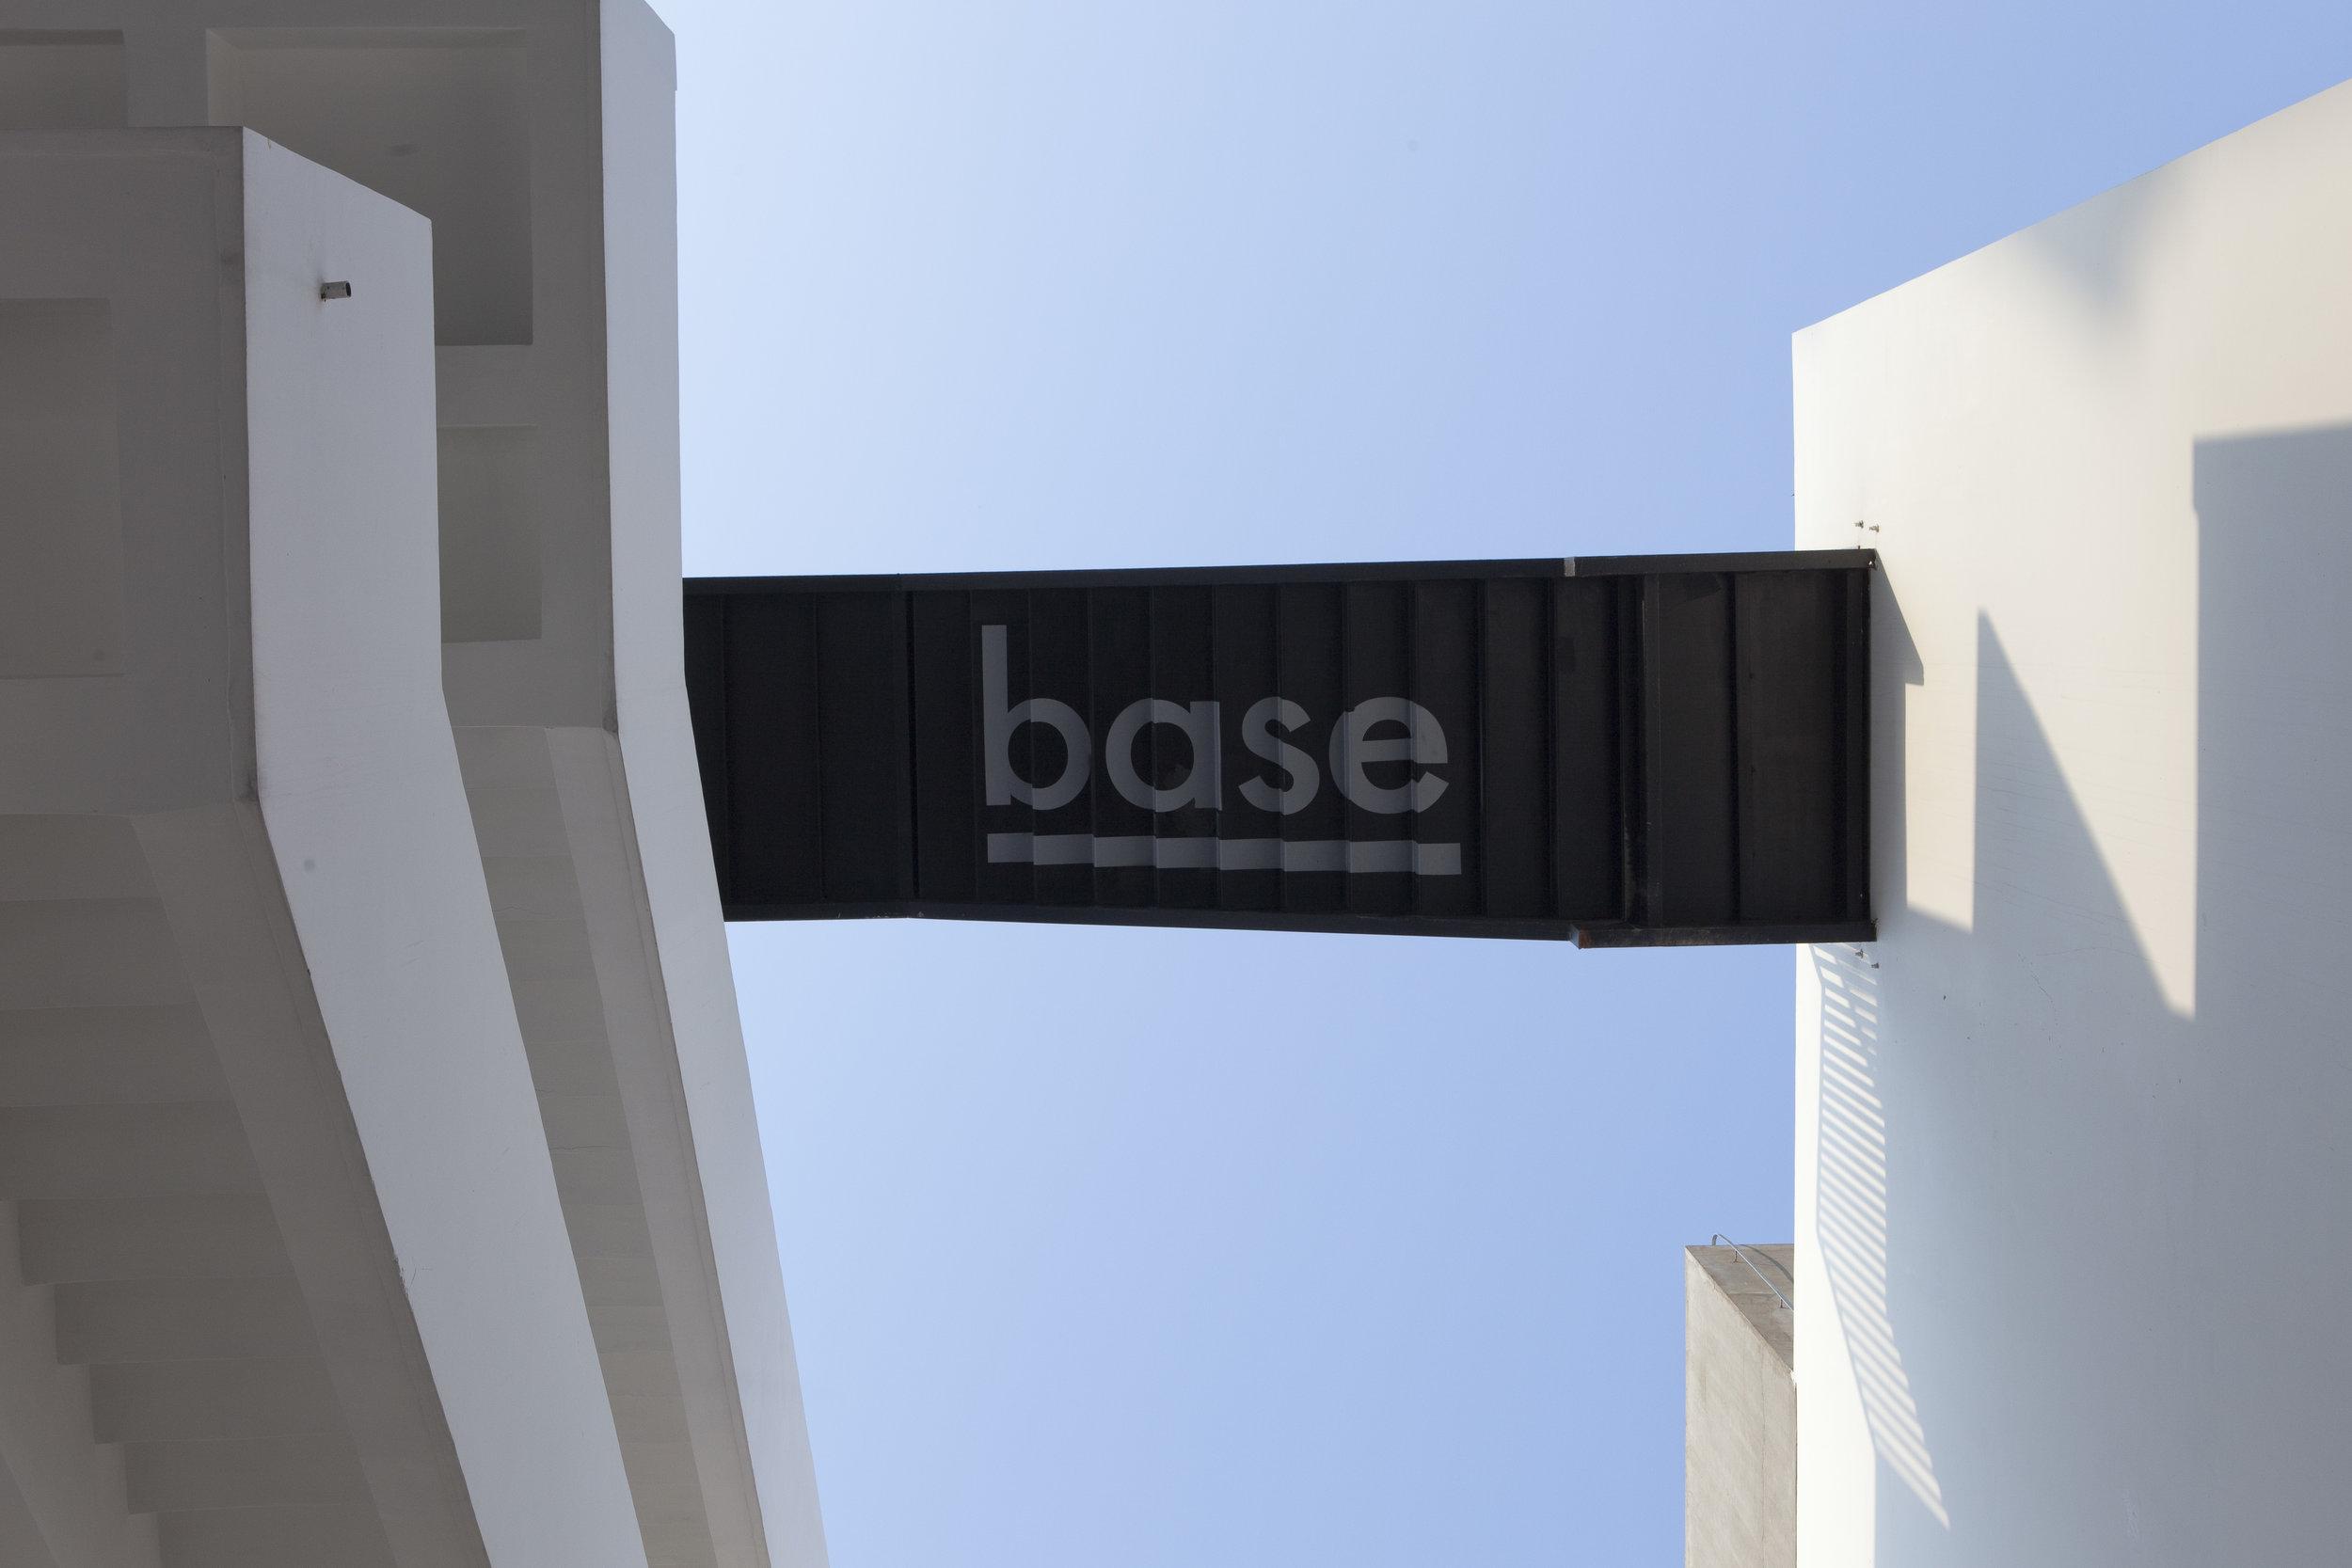 base_hotel_109_hr.jpg